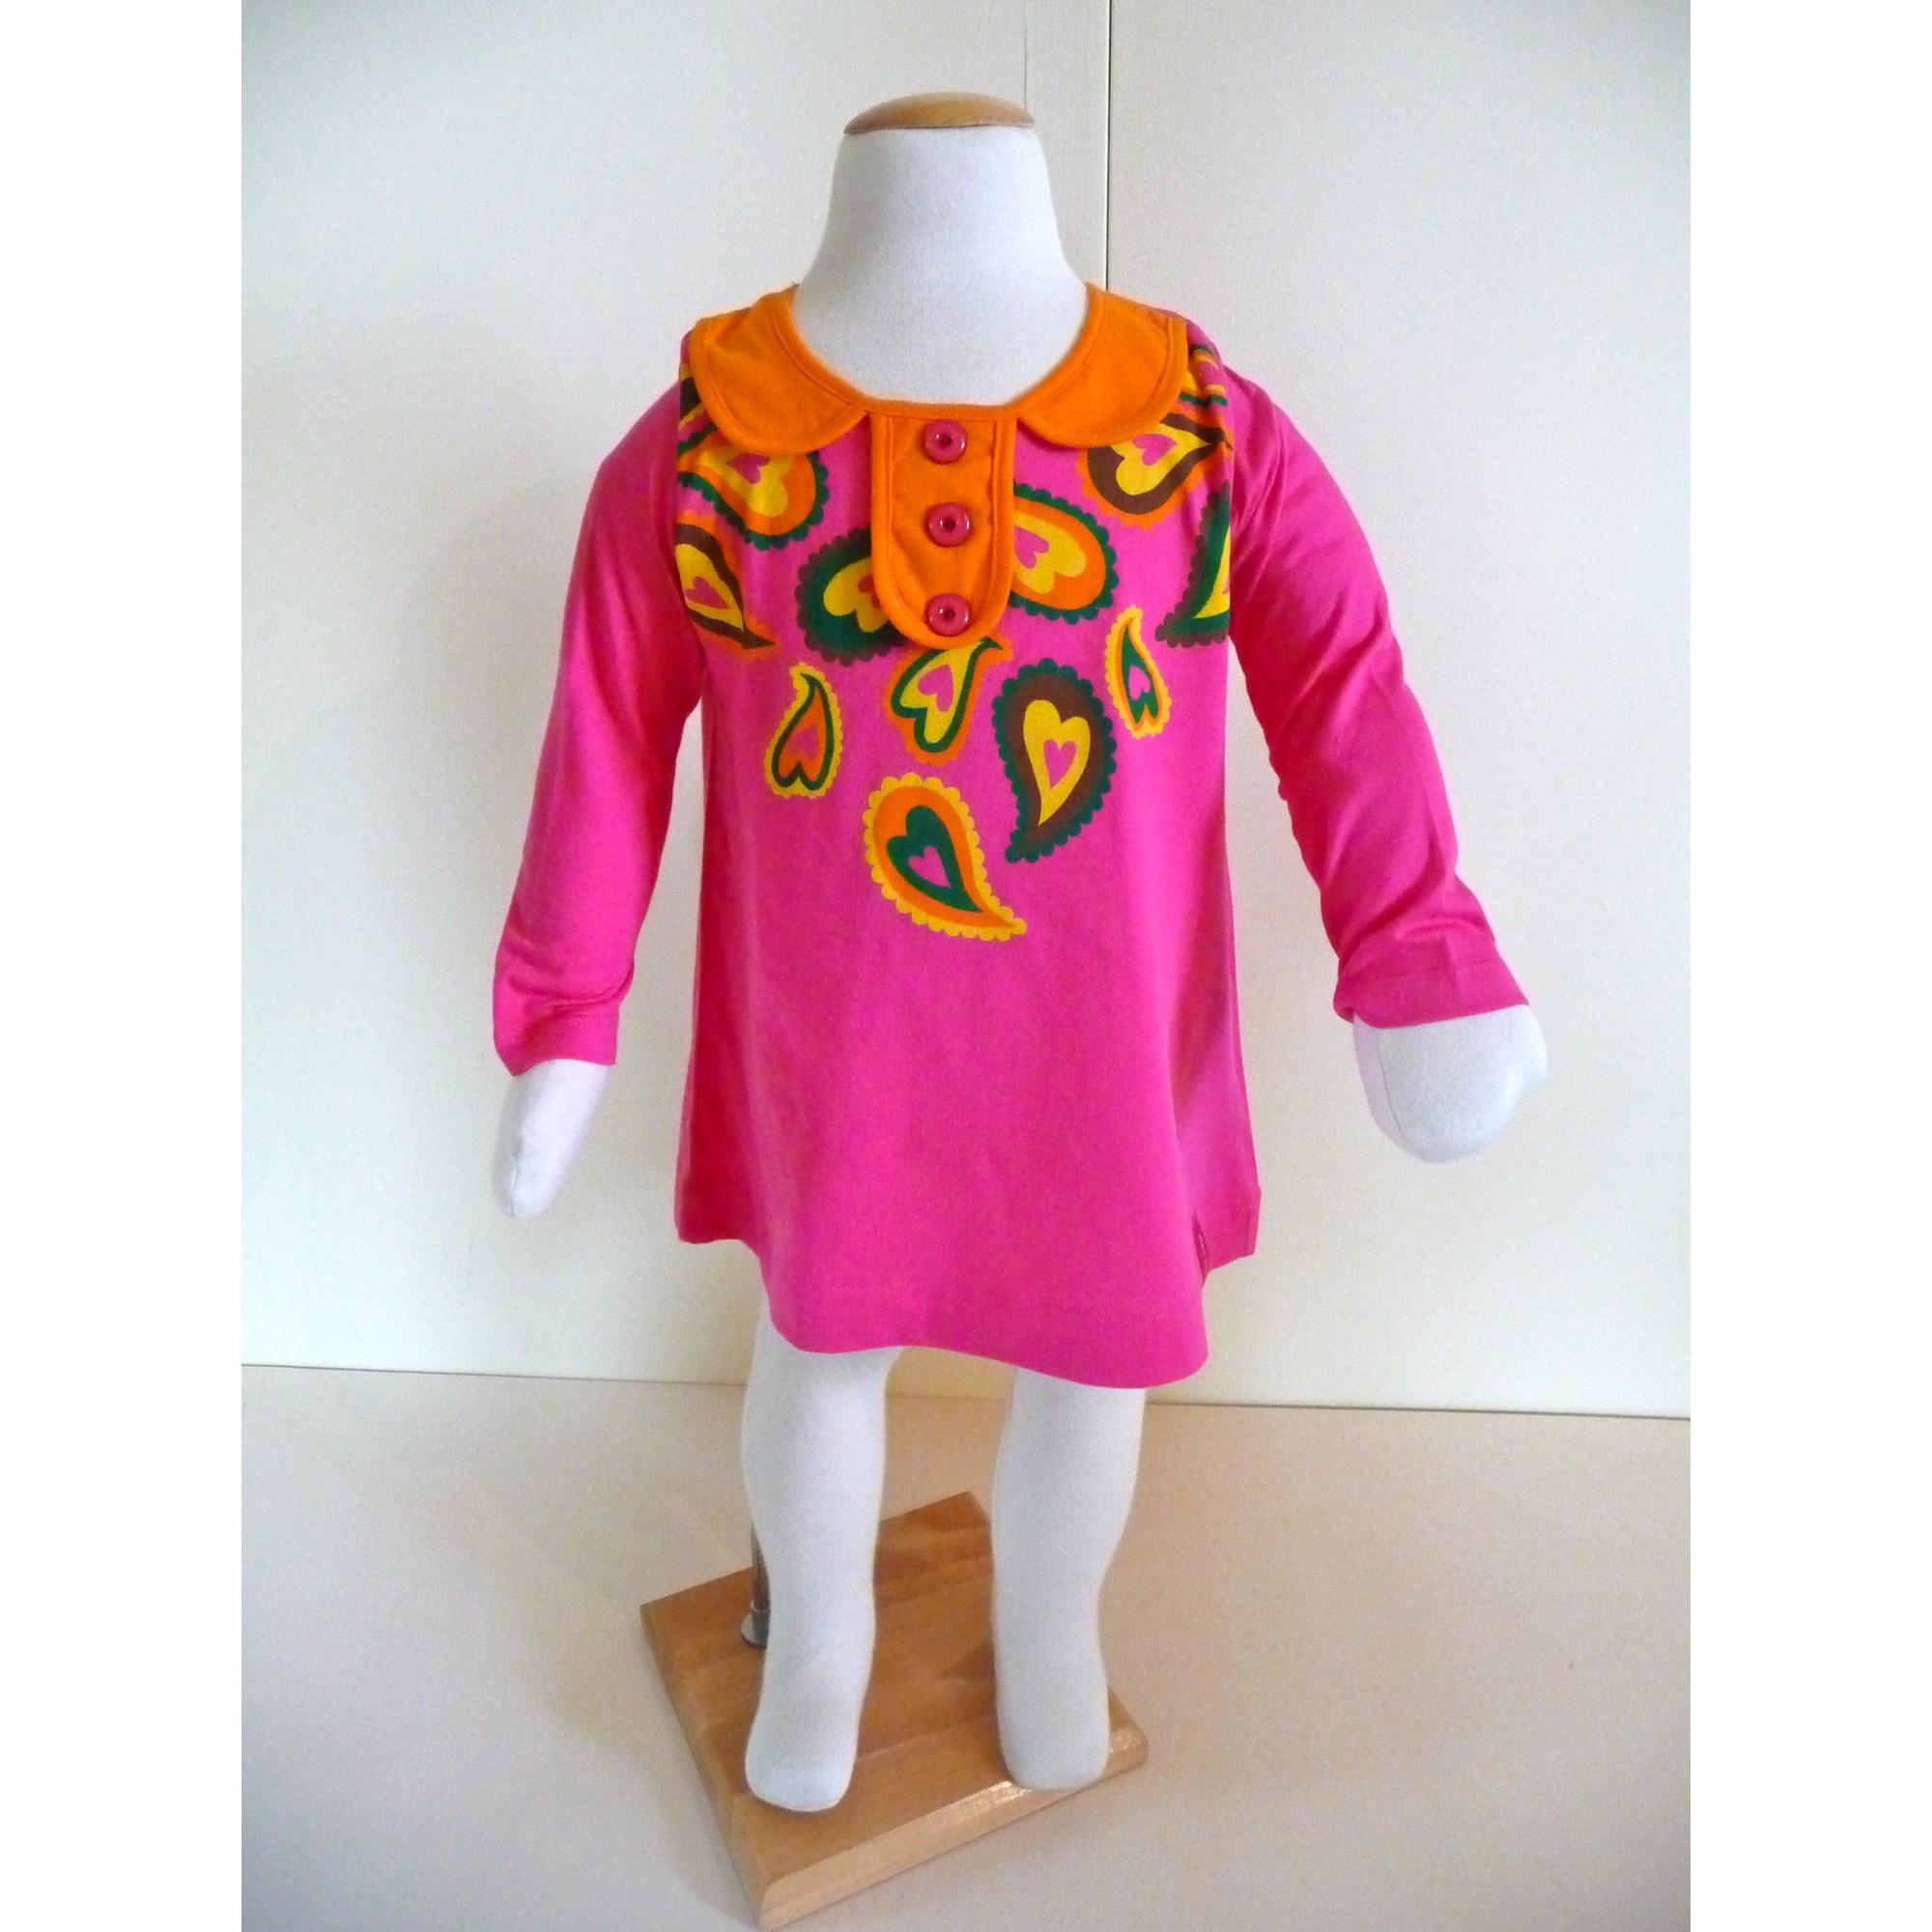 Top, Tee-shirt AGATHA RUIZ DE LA PRADA coton orange 2 ans